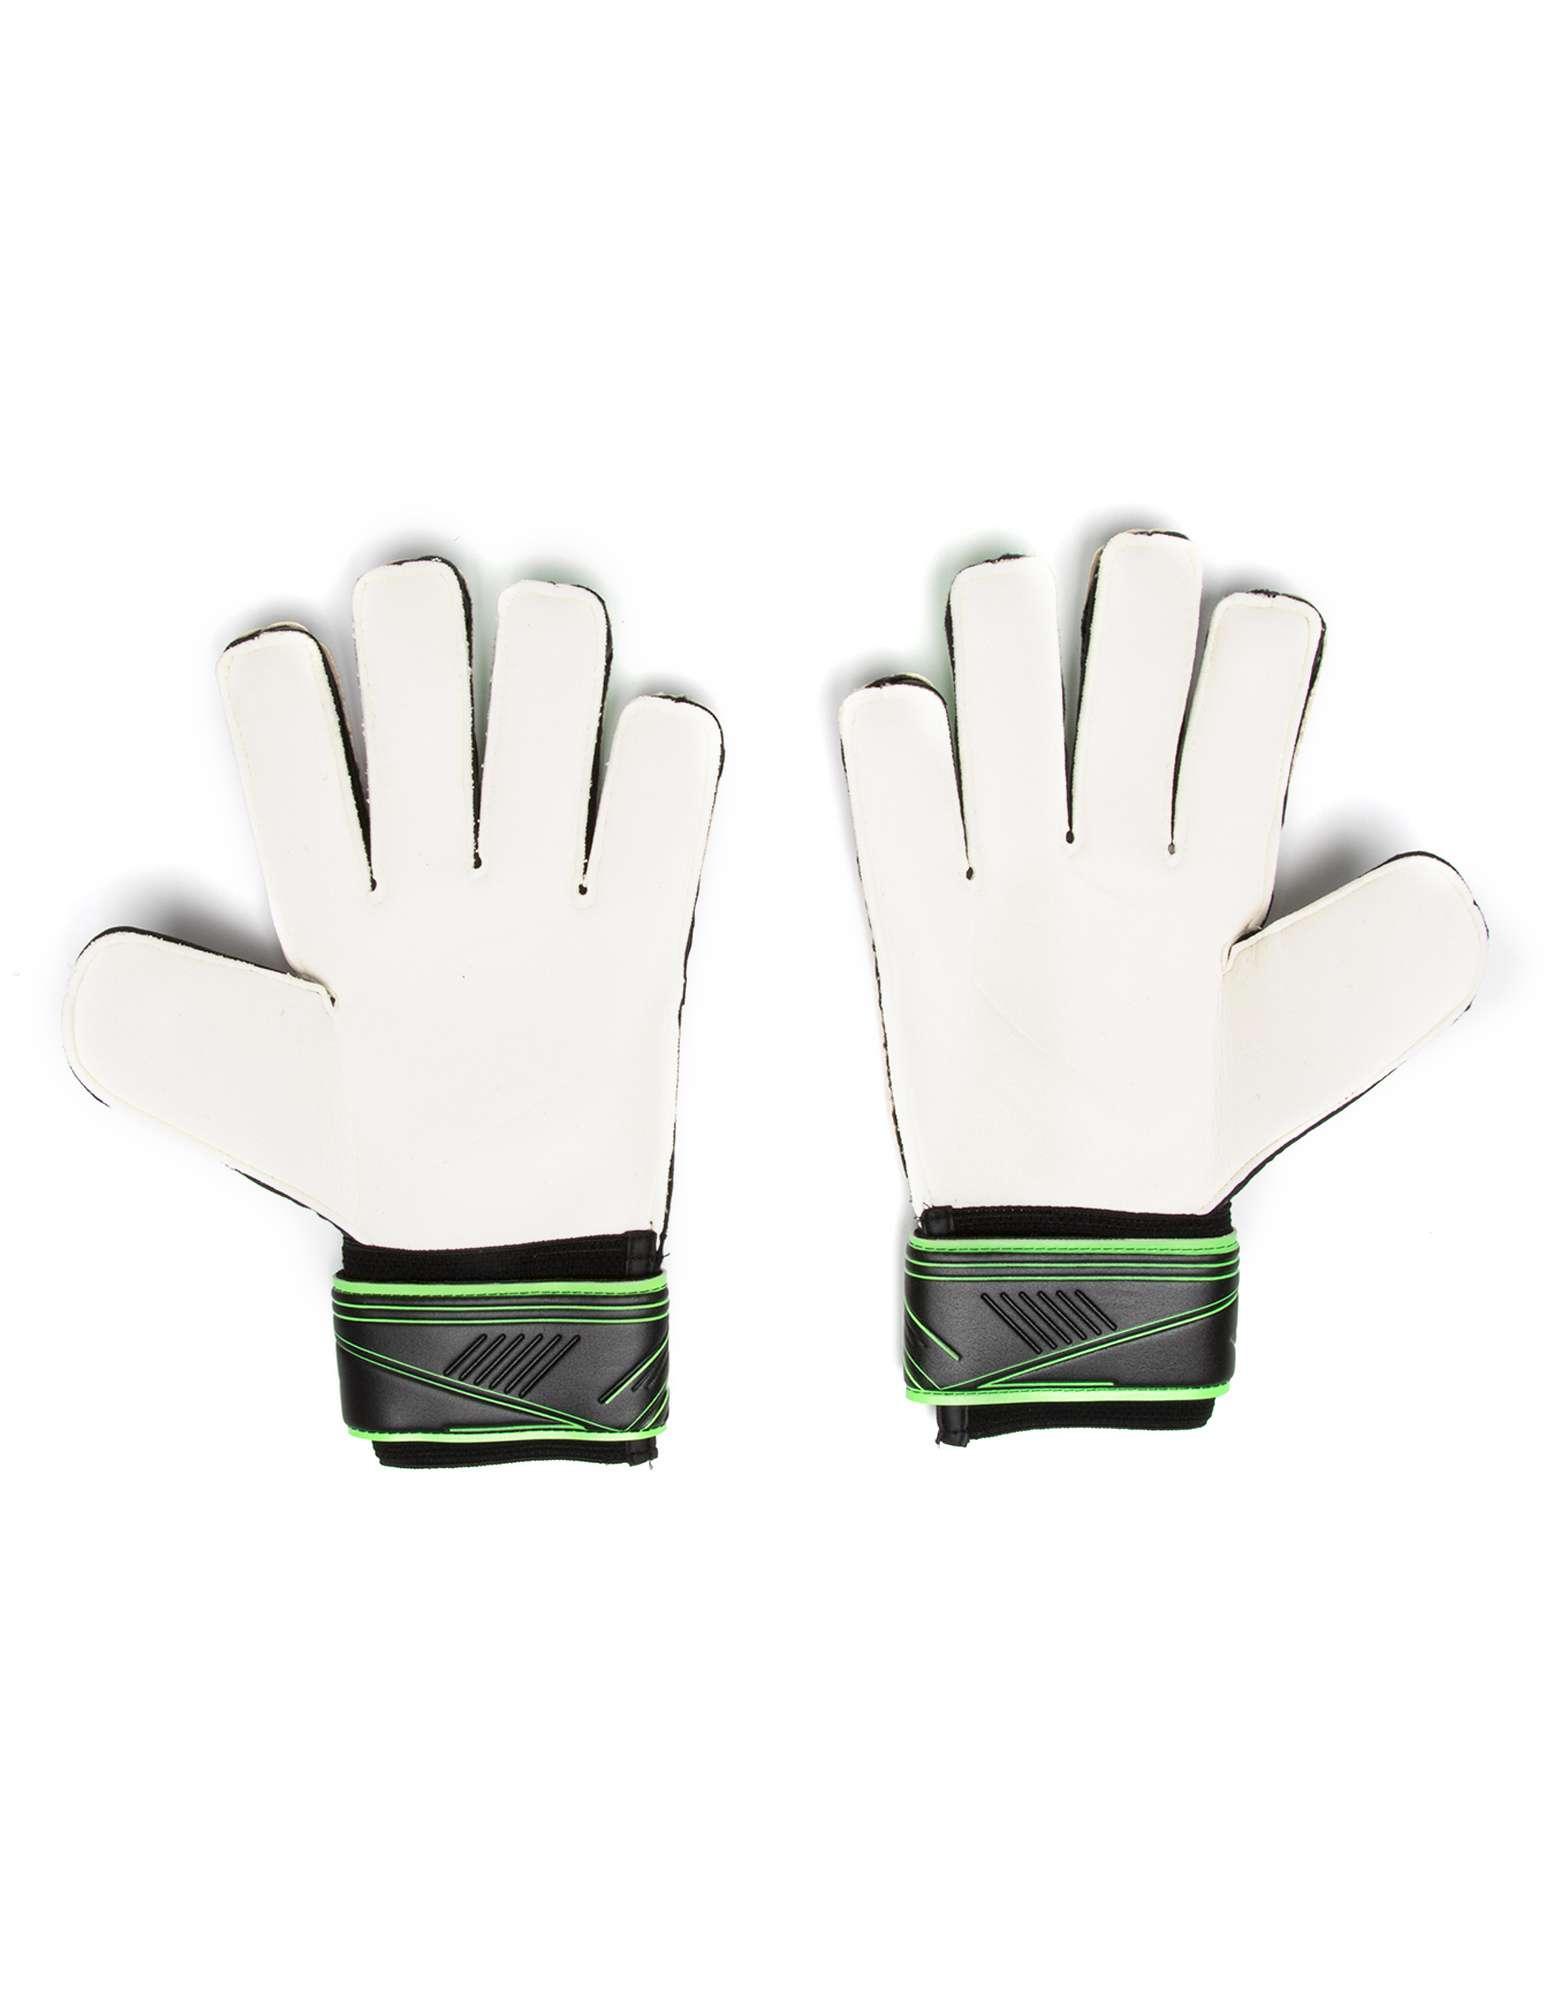 adidas Predator Fingersave Goalkeeper Gloves